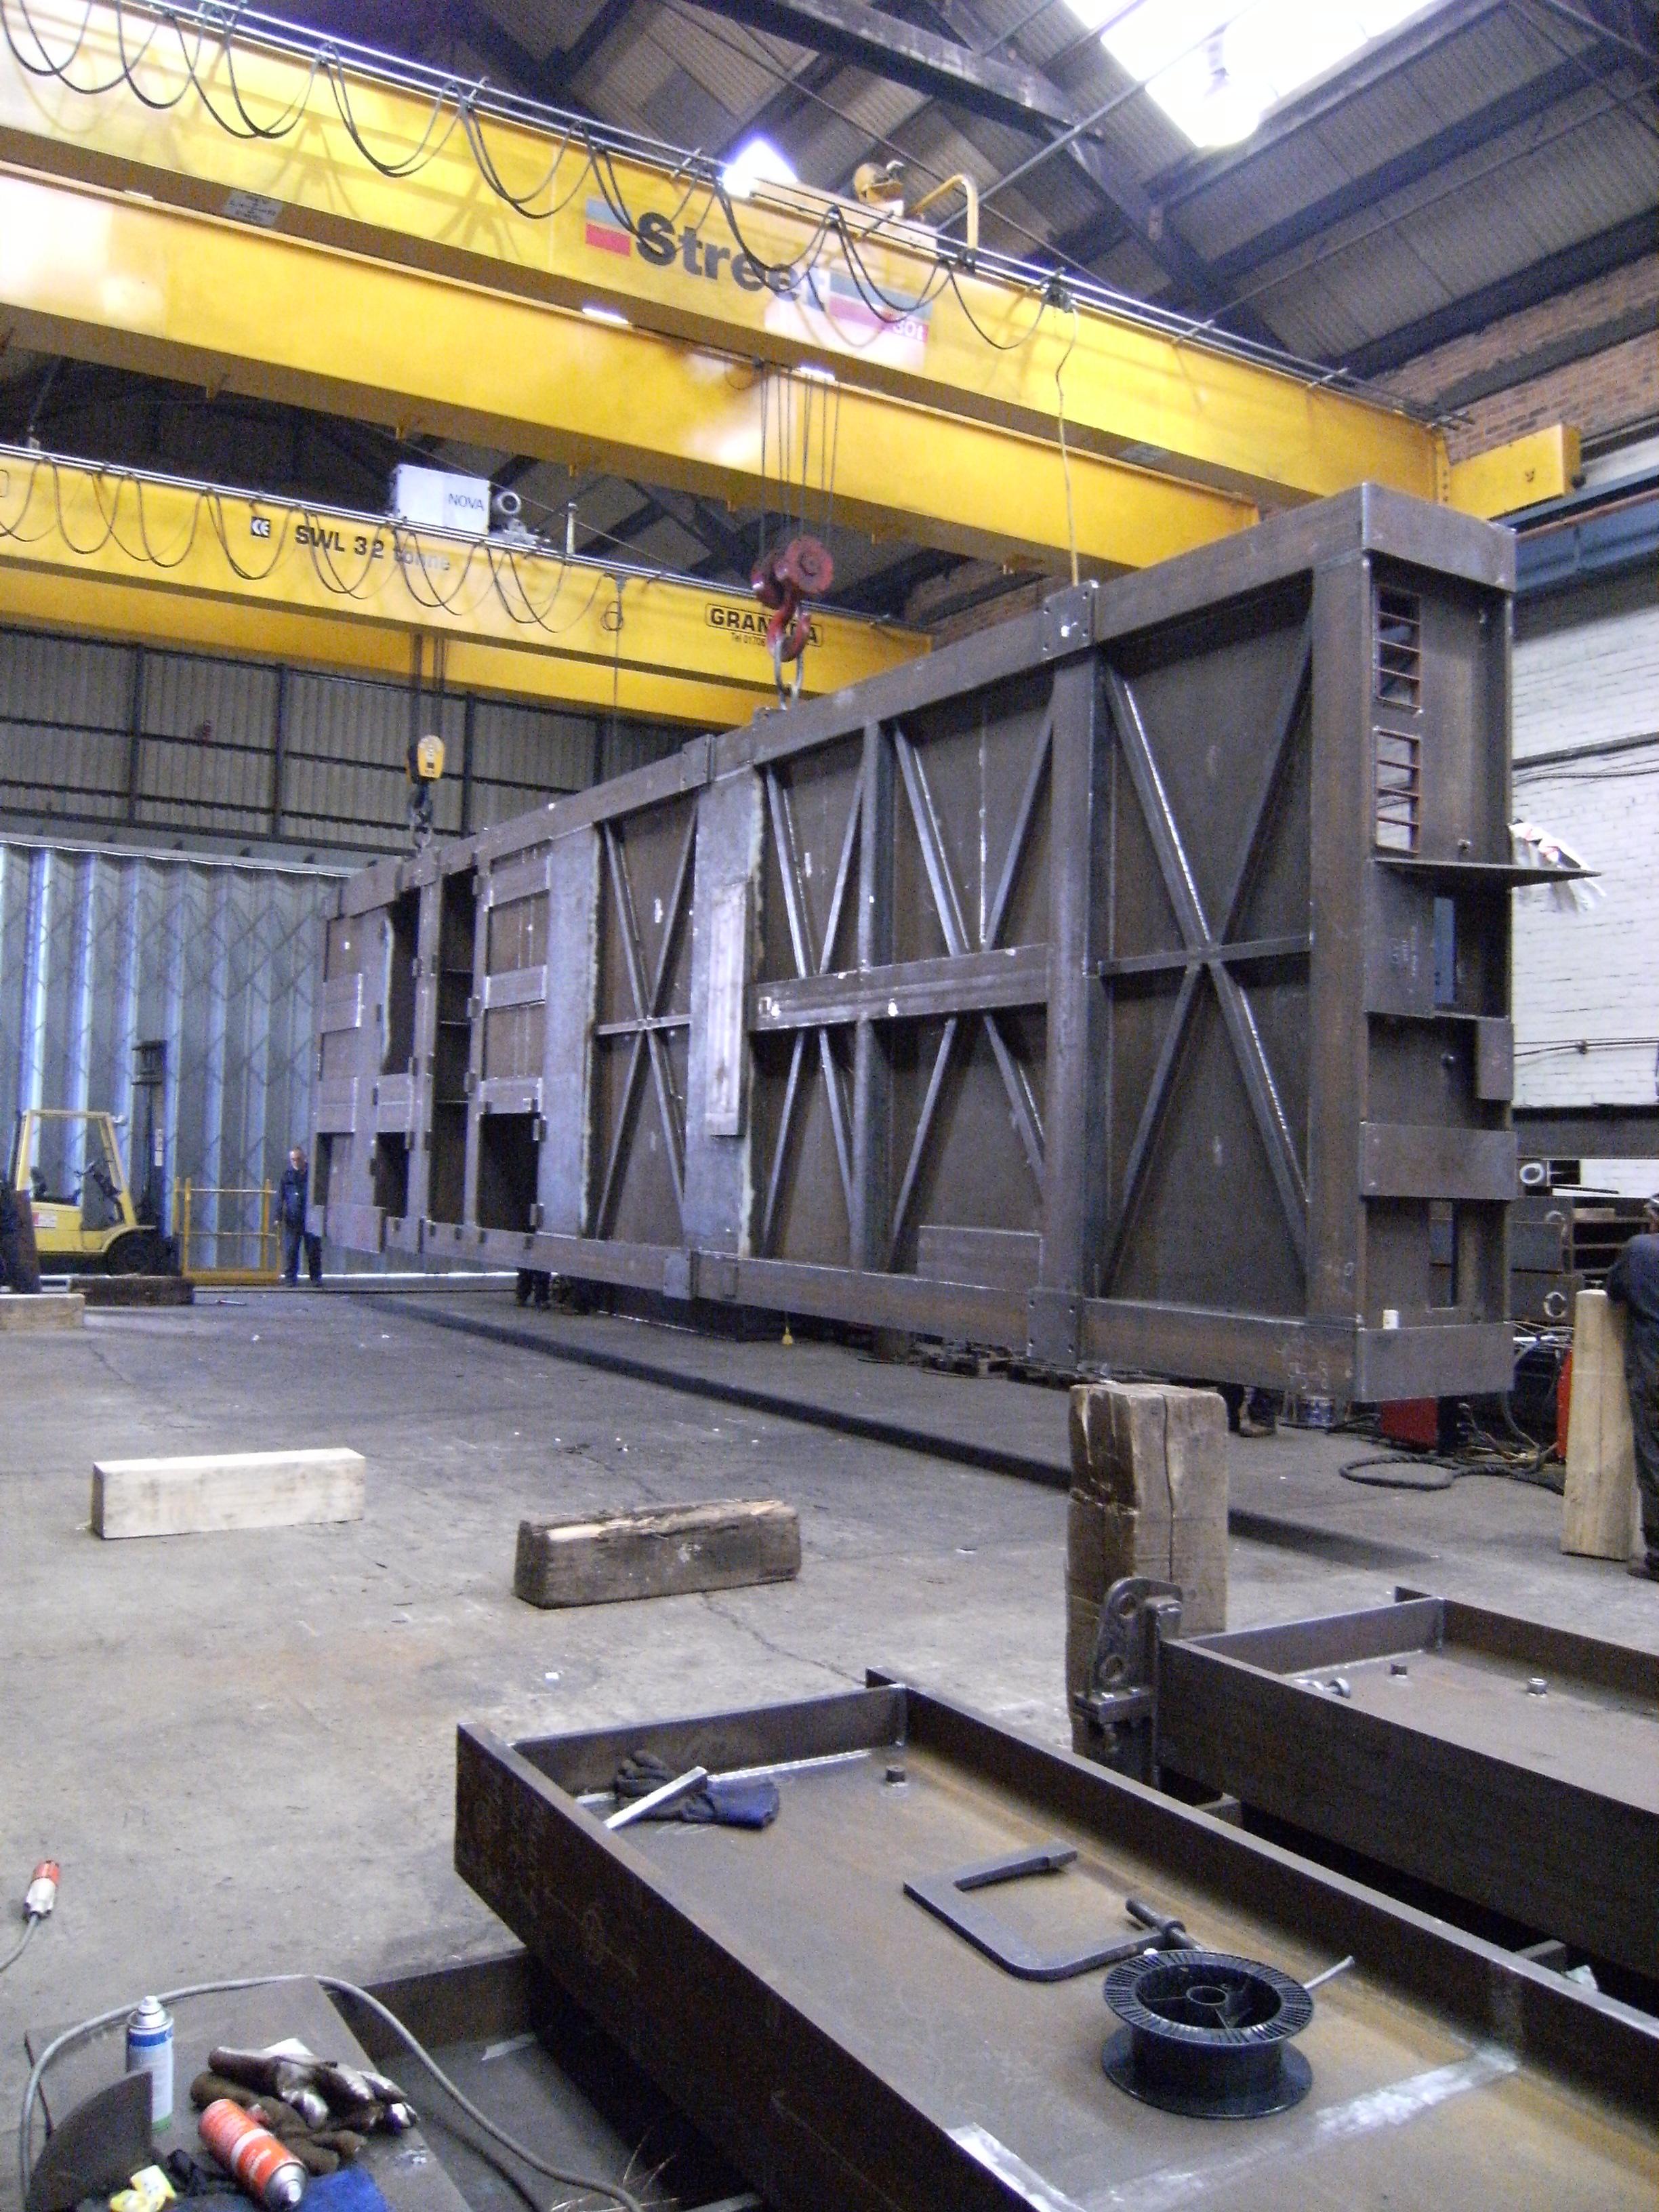 64 tonne generator baseplate